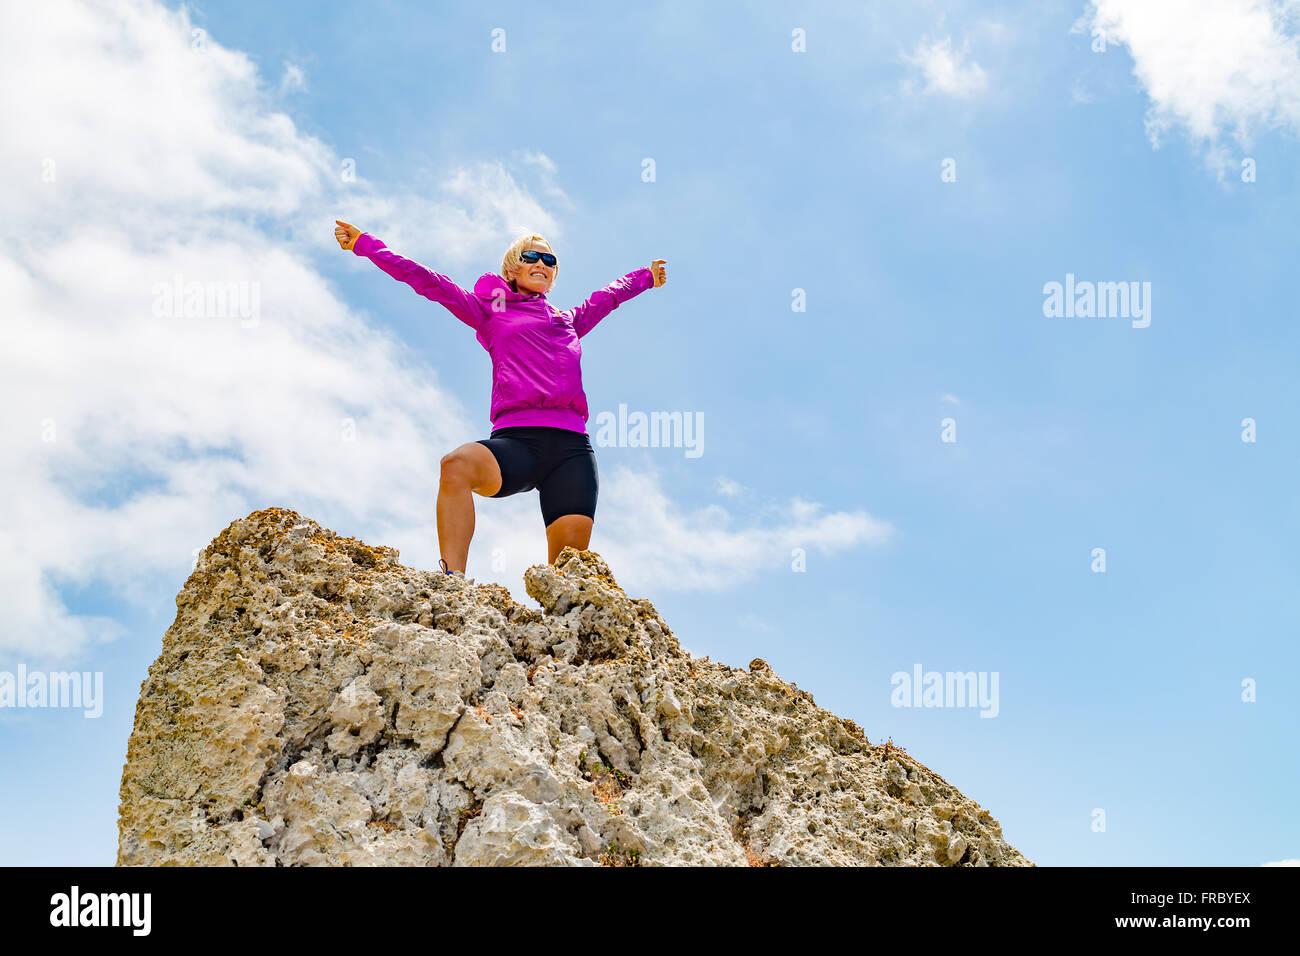 Acomplishment success achievement running or hiking accomplishment